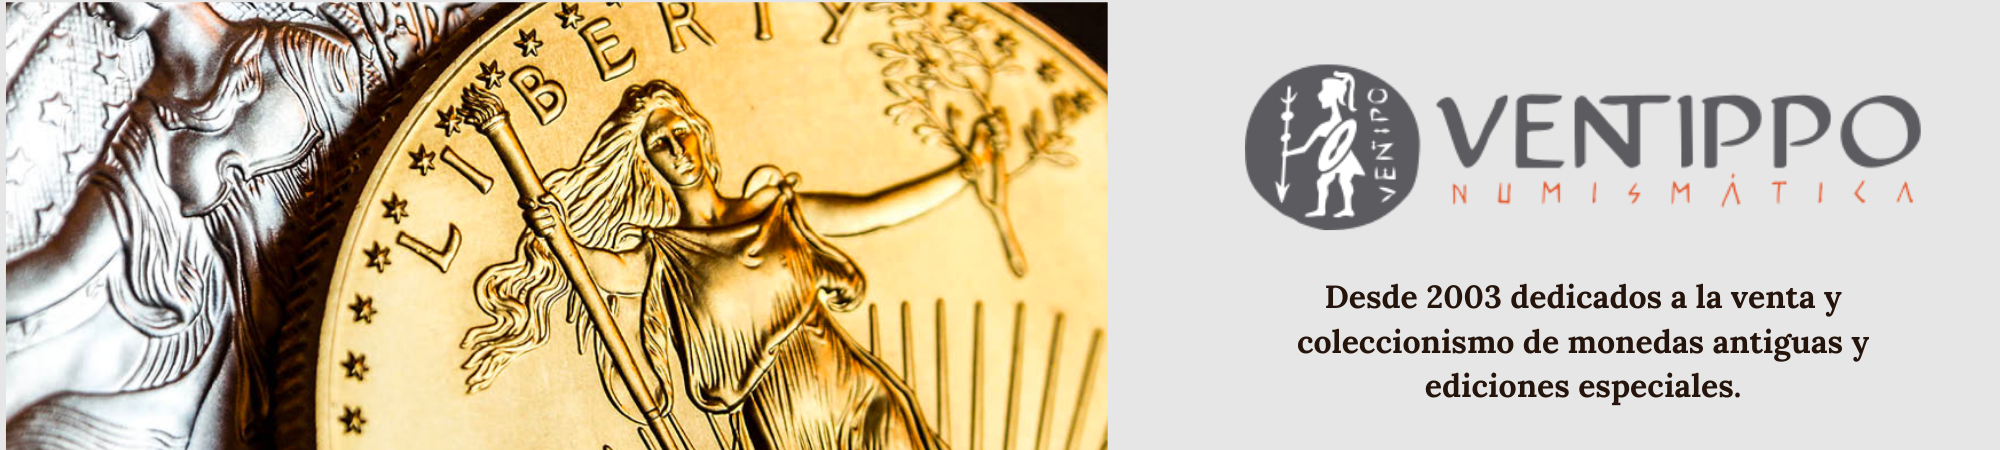 banner numismatica ventippo